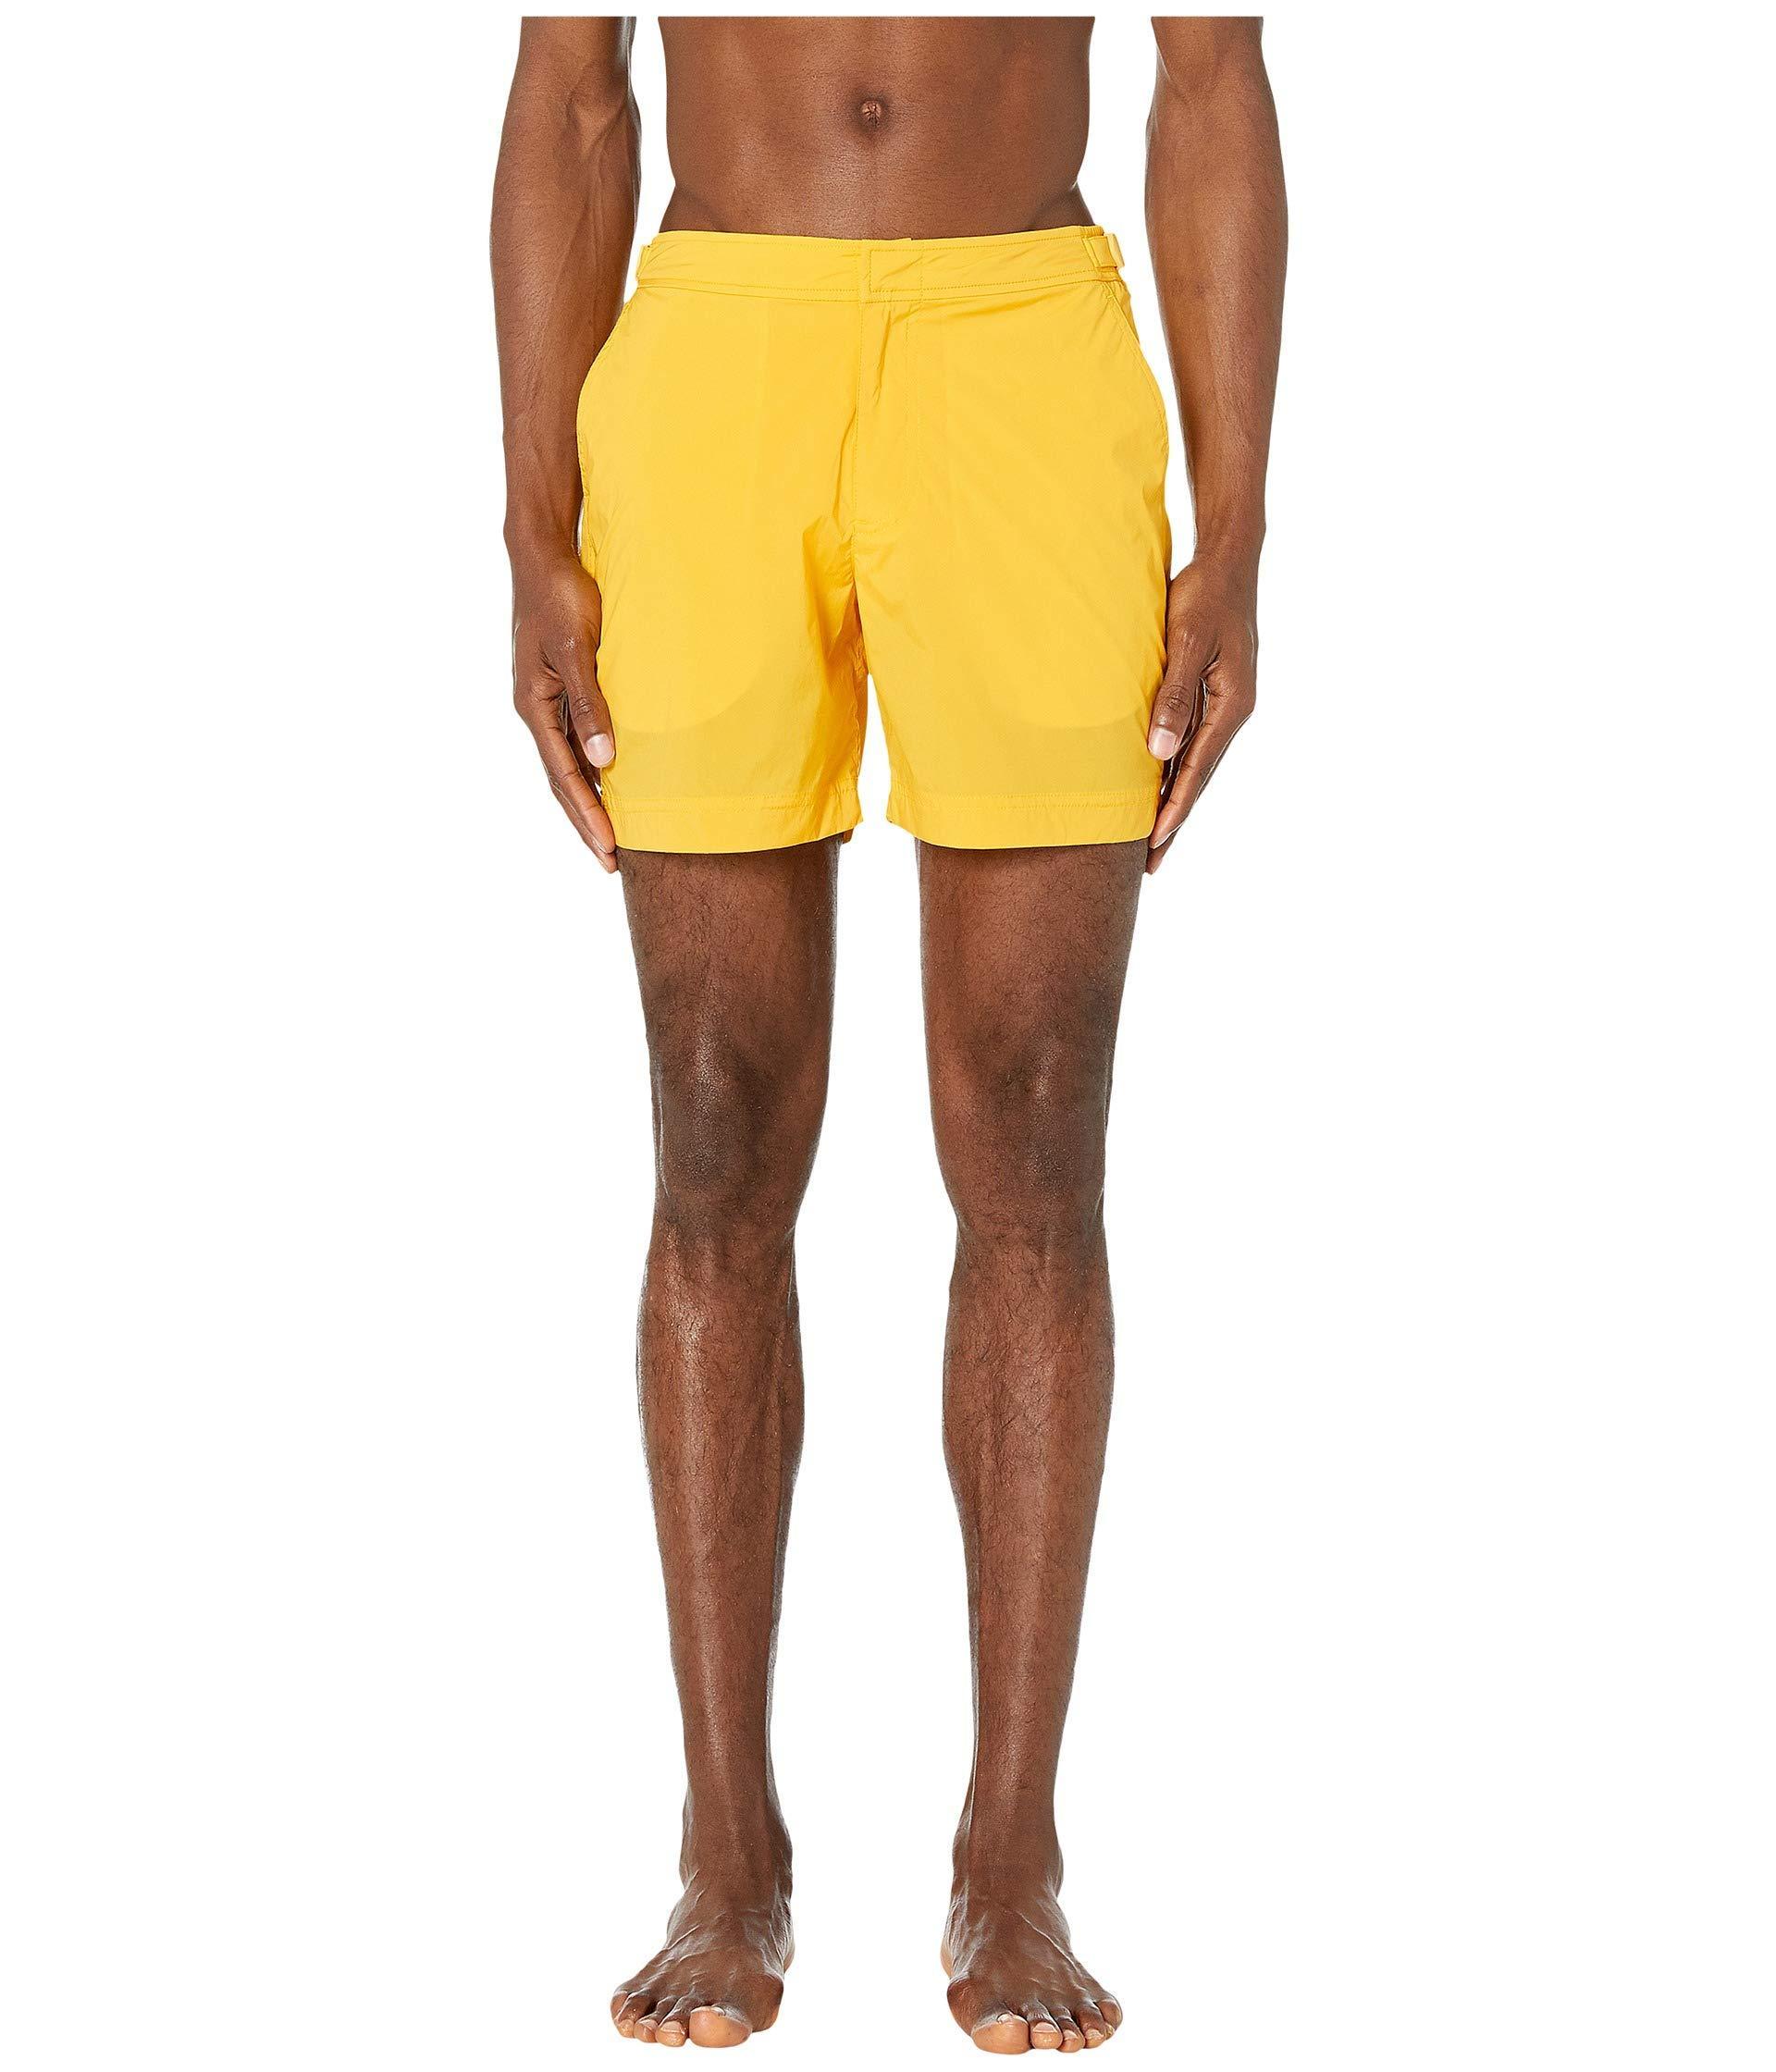 652768a16b Orlebar Brown Bulldog Sport Swim Shorts (ebony) Men's Swimwear in ...